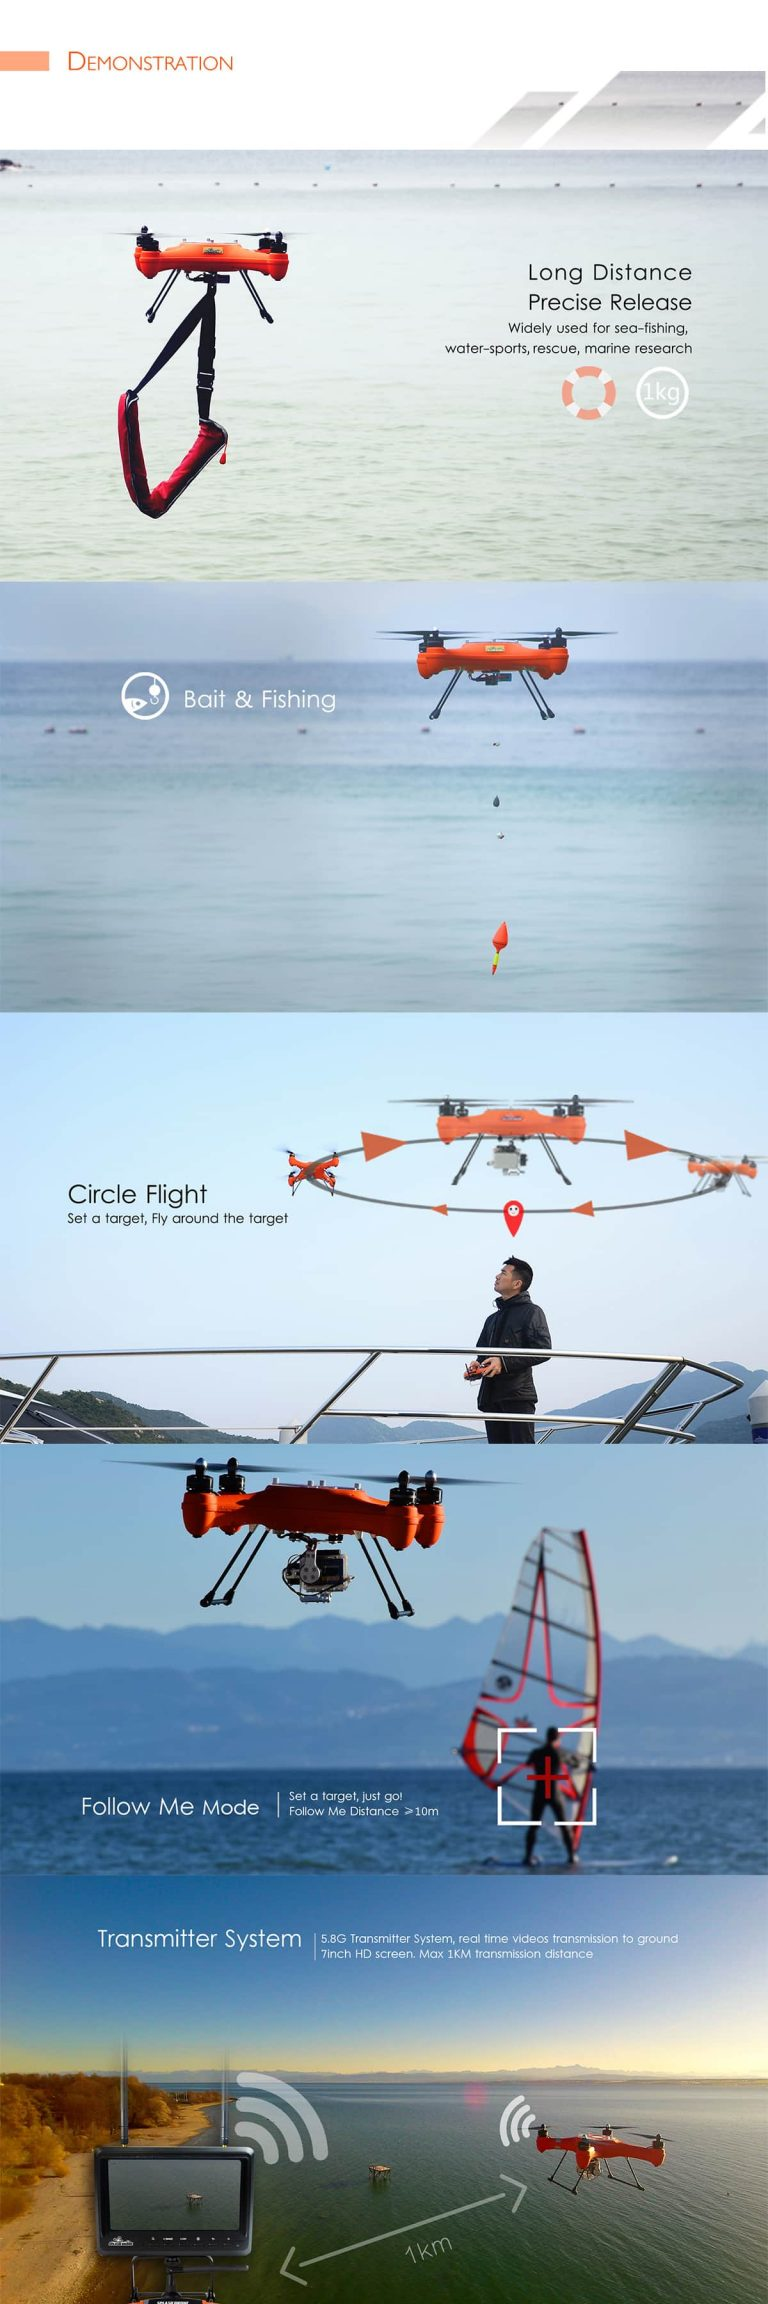 SwellPro Waterproof Drone Demo